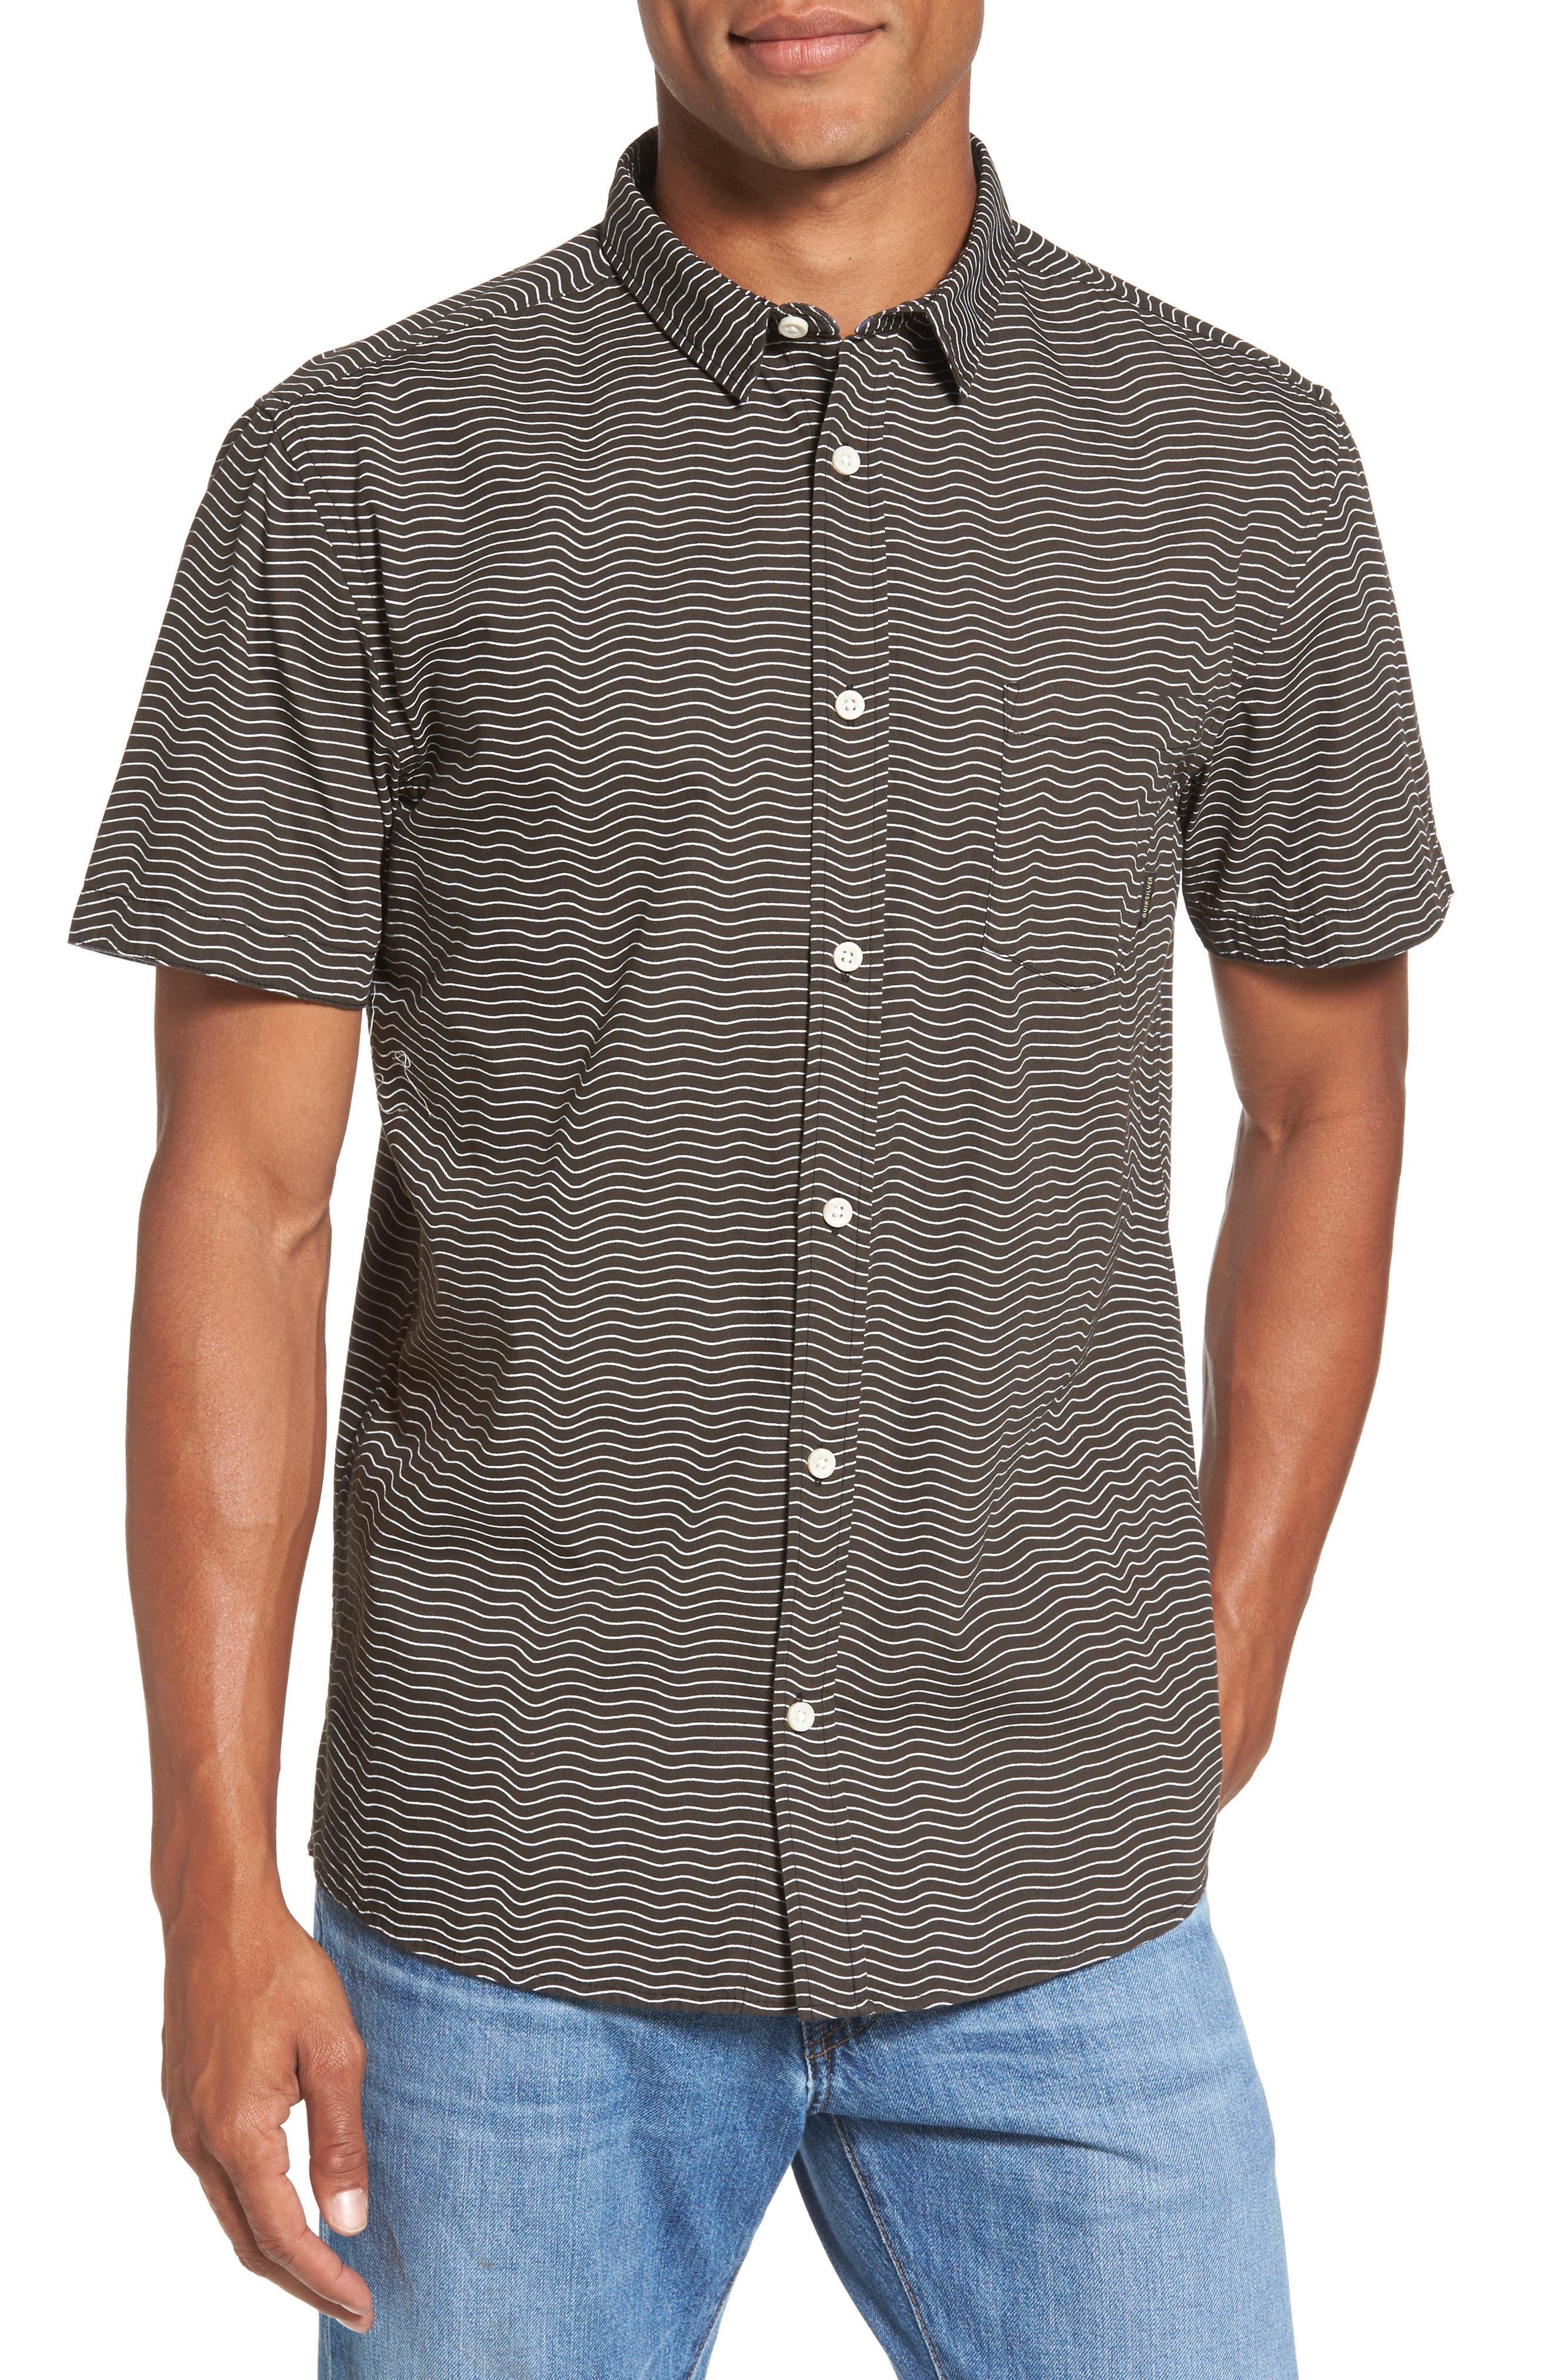 Heat Wave Stripe Shirt,                             Main thumbnail 1, color,                             002